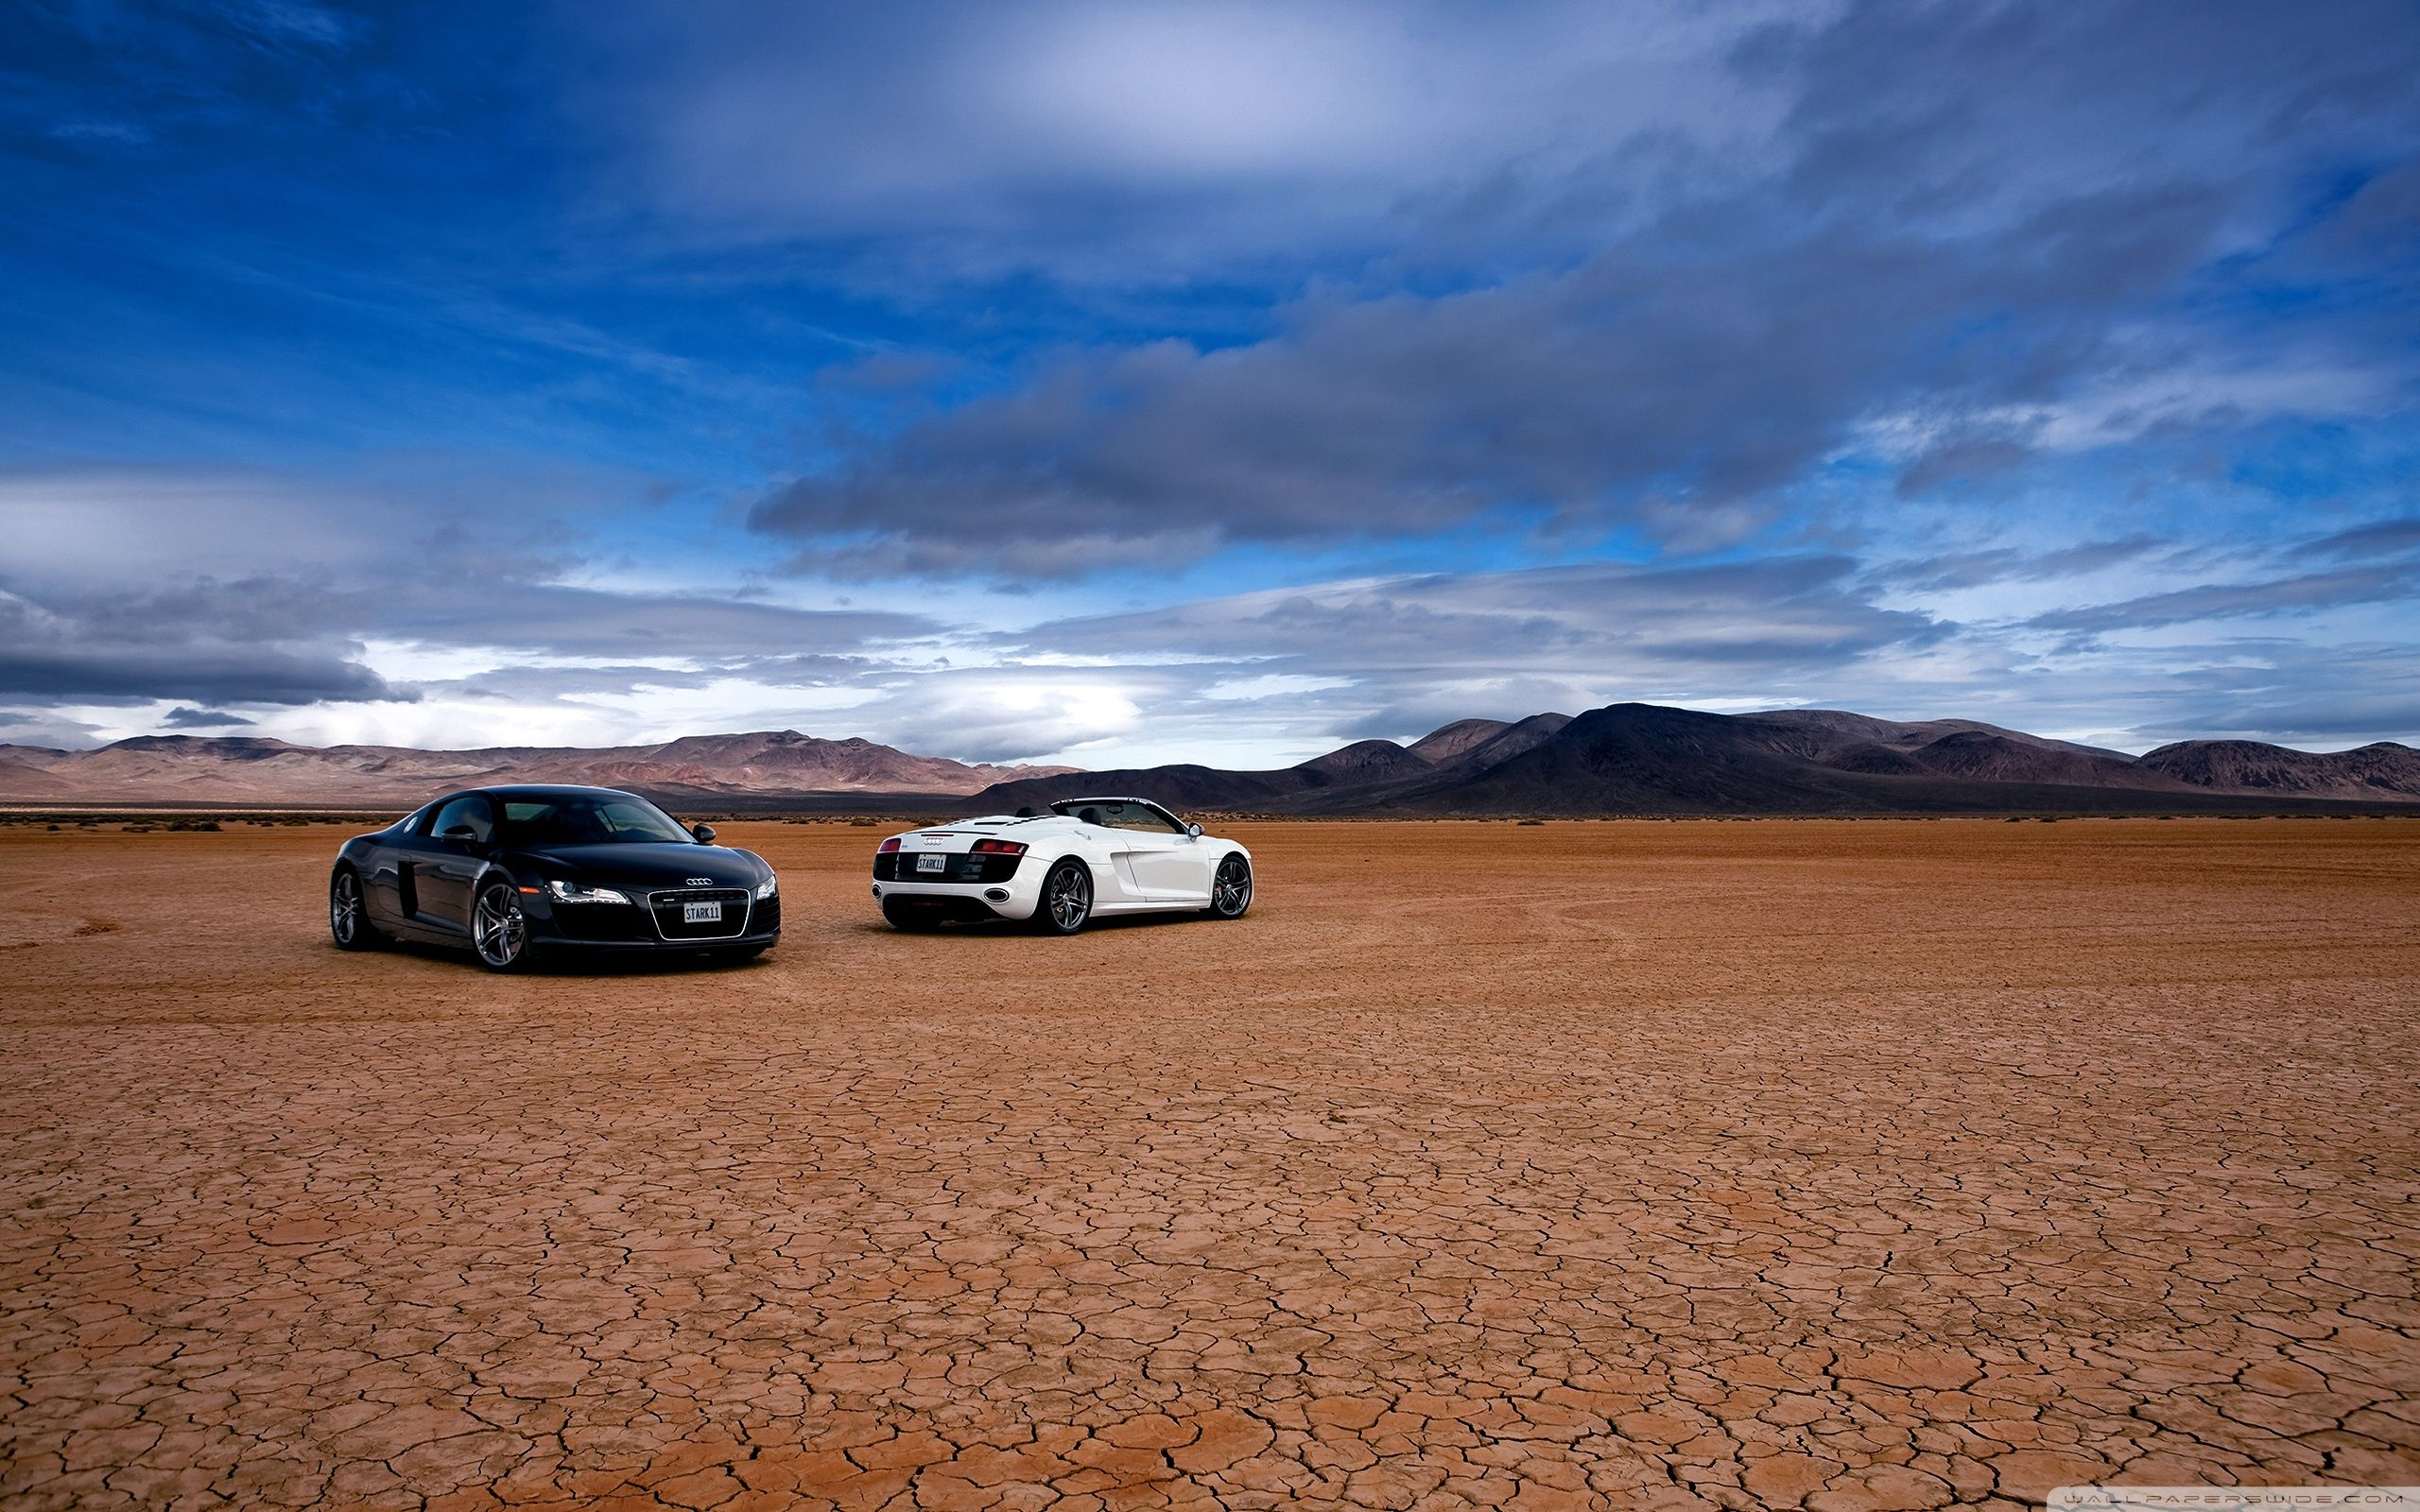 Desert Wallpapers Best Wallpapers Audi Wallpaper Desert Landscaping